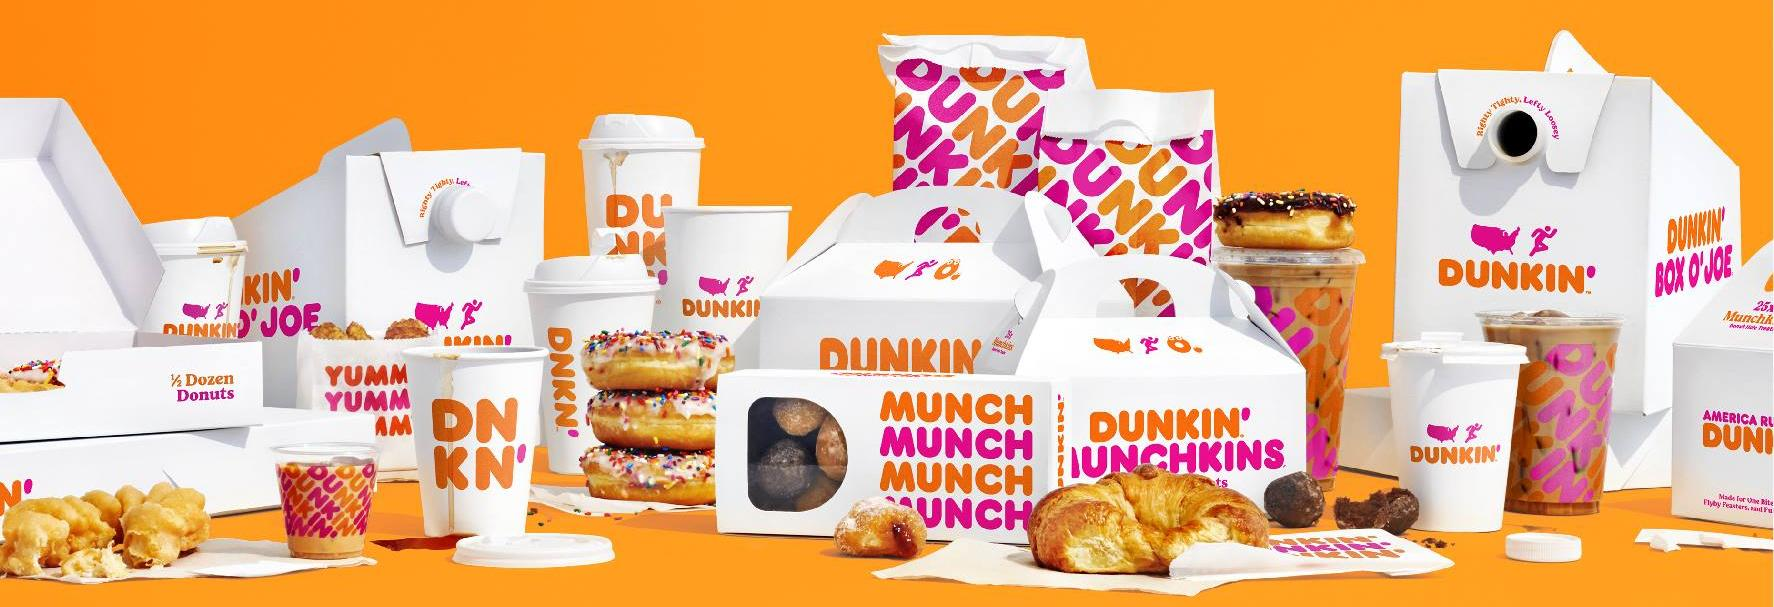 dunkin donuts  findlay coffee drive thru lattes donuts